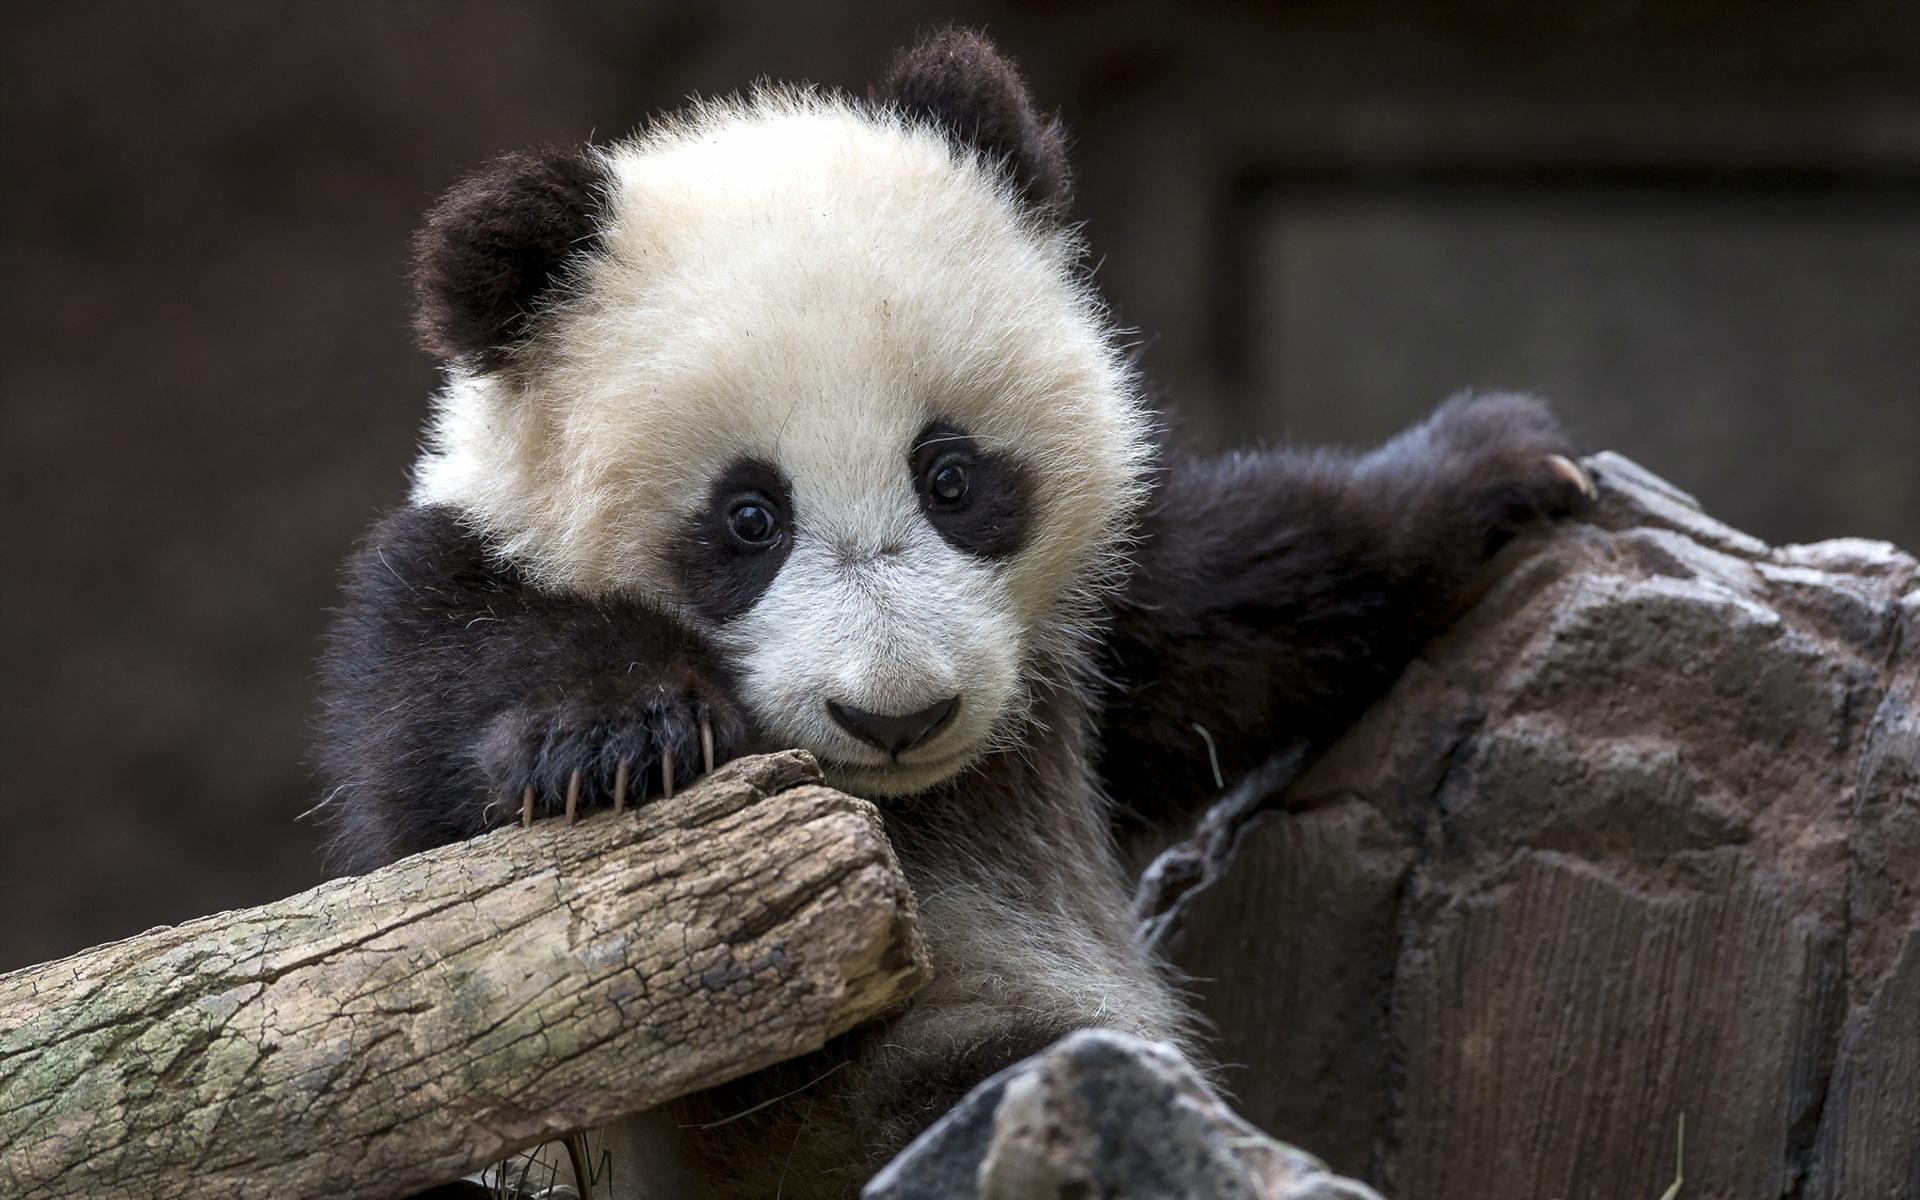 Panda Full HD Wallpaper and Background Image   1920x1200   ID:349739